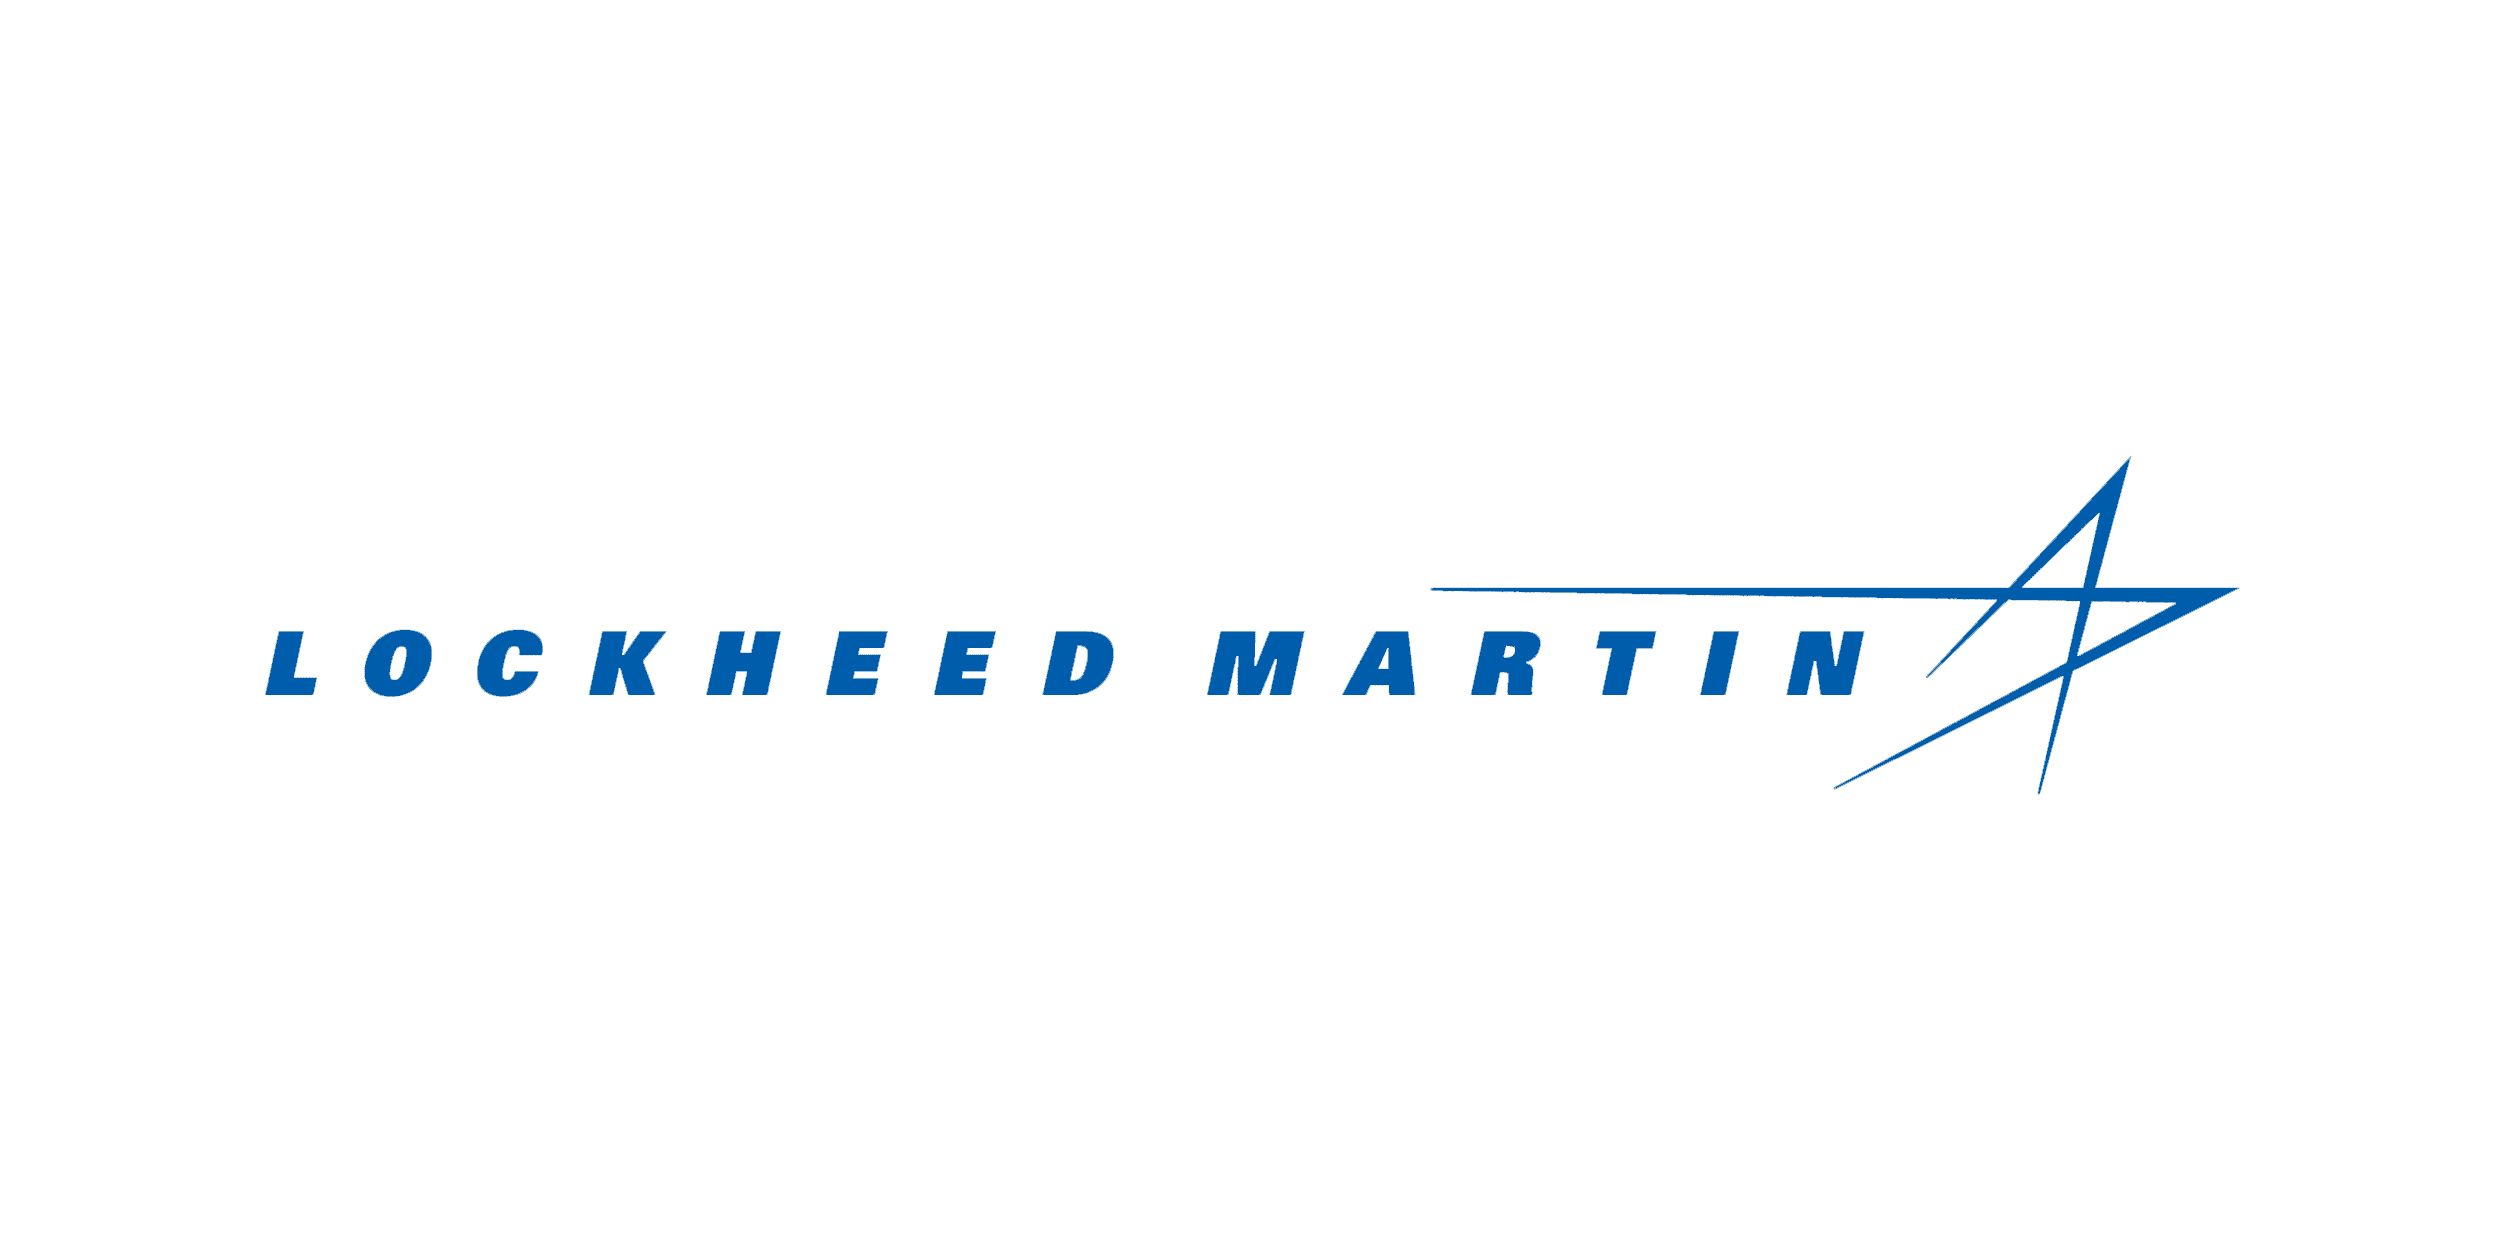 Logotipo de Lockheed Martin Corporation